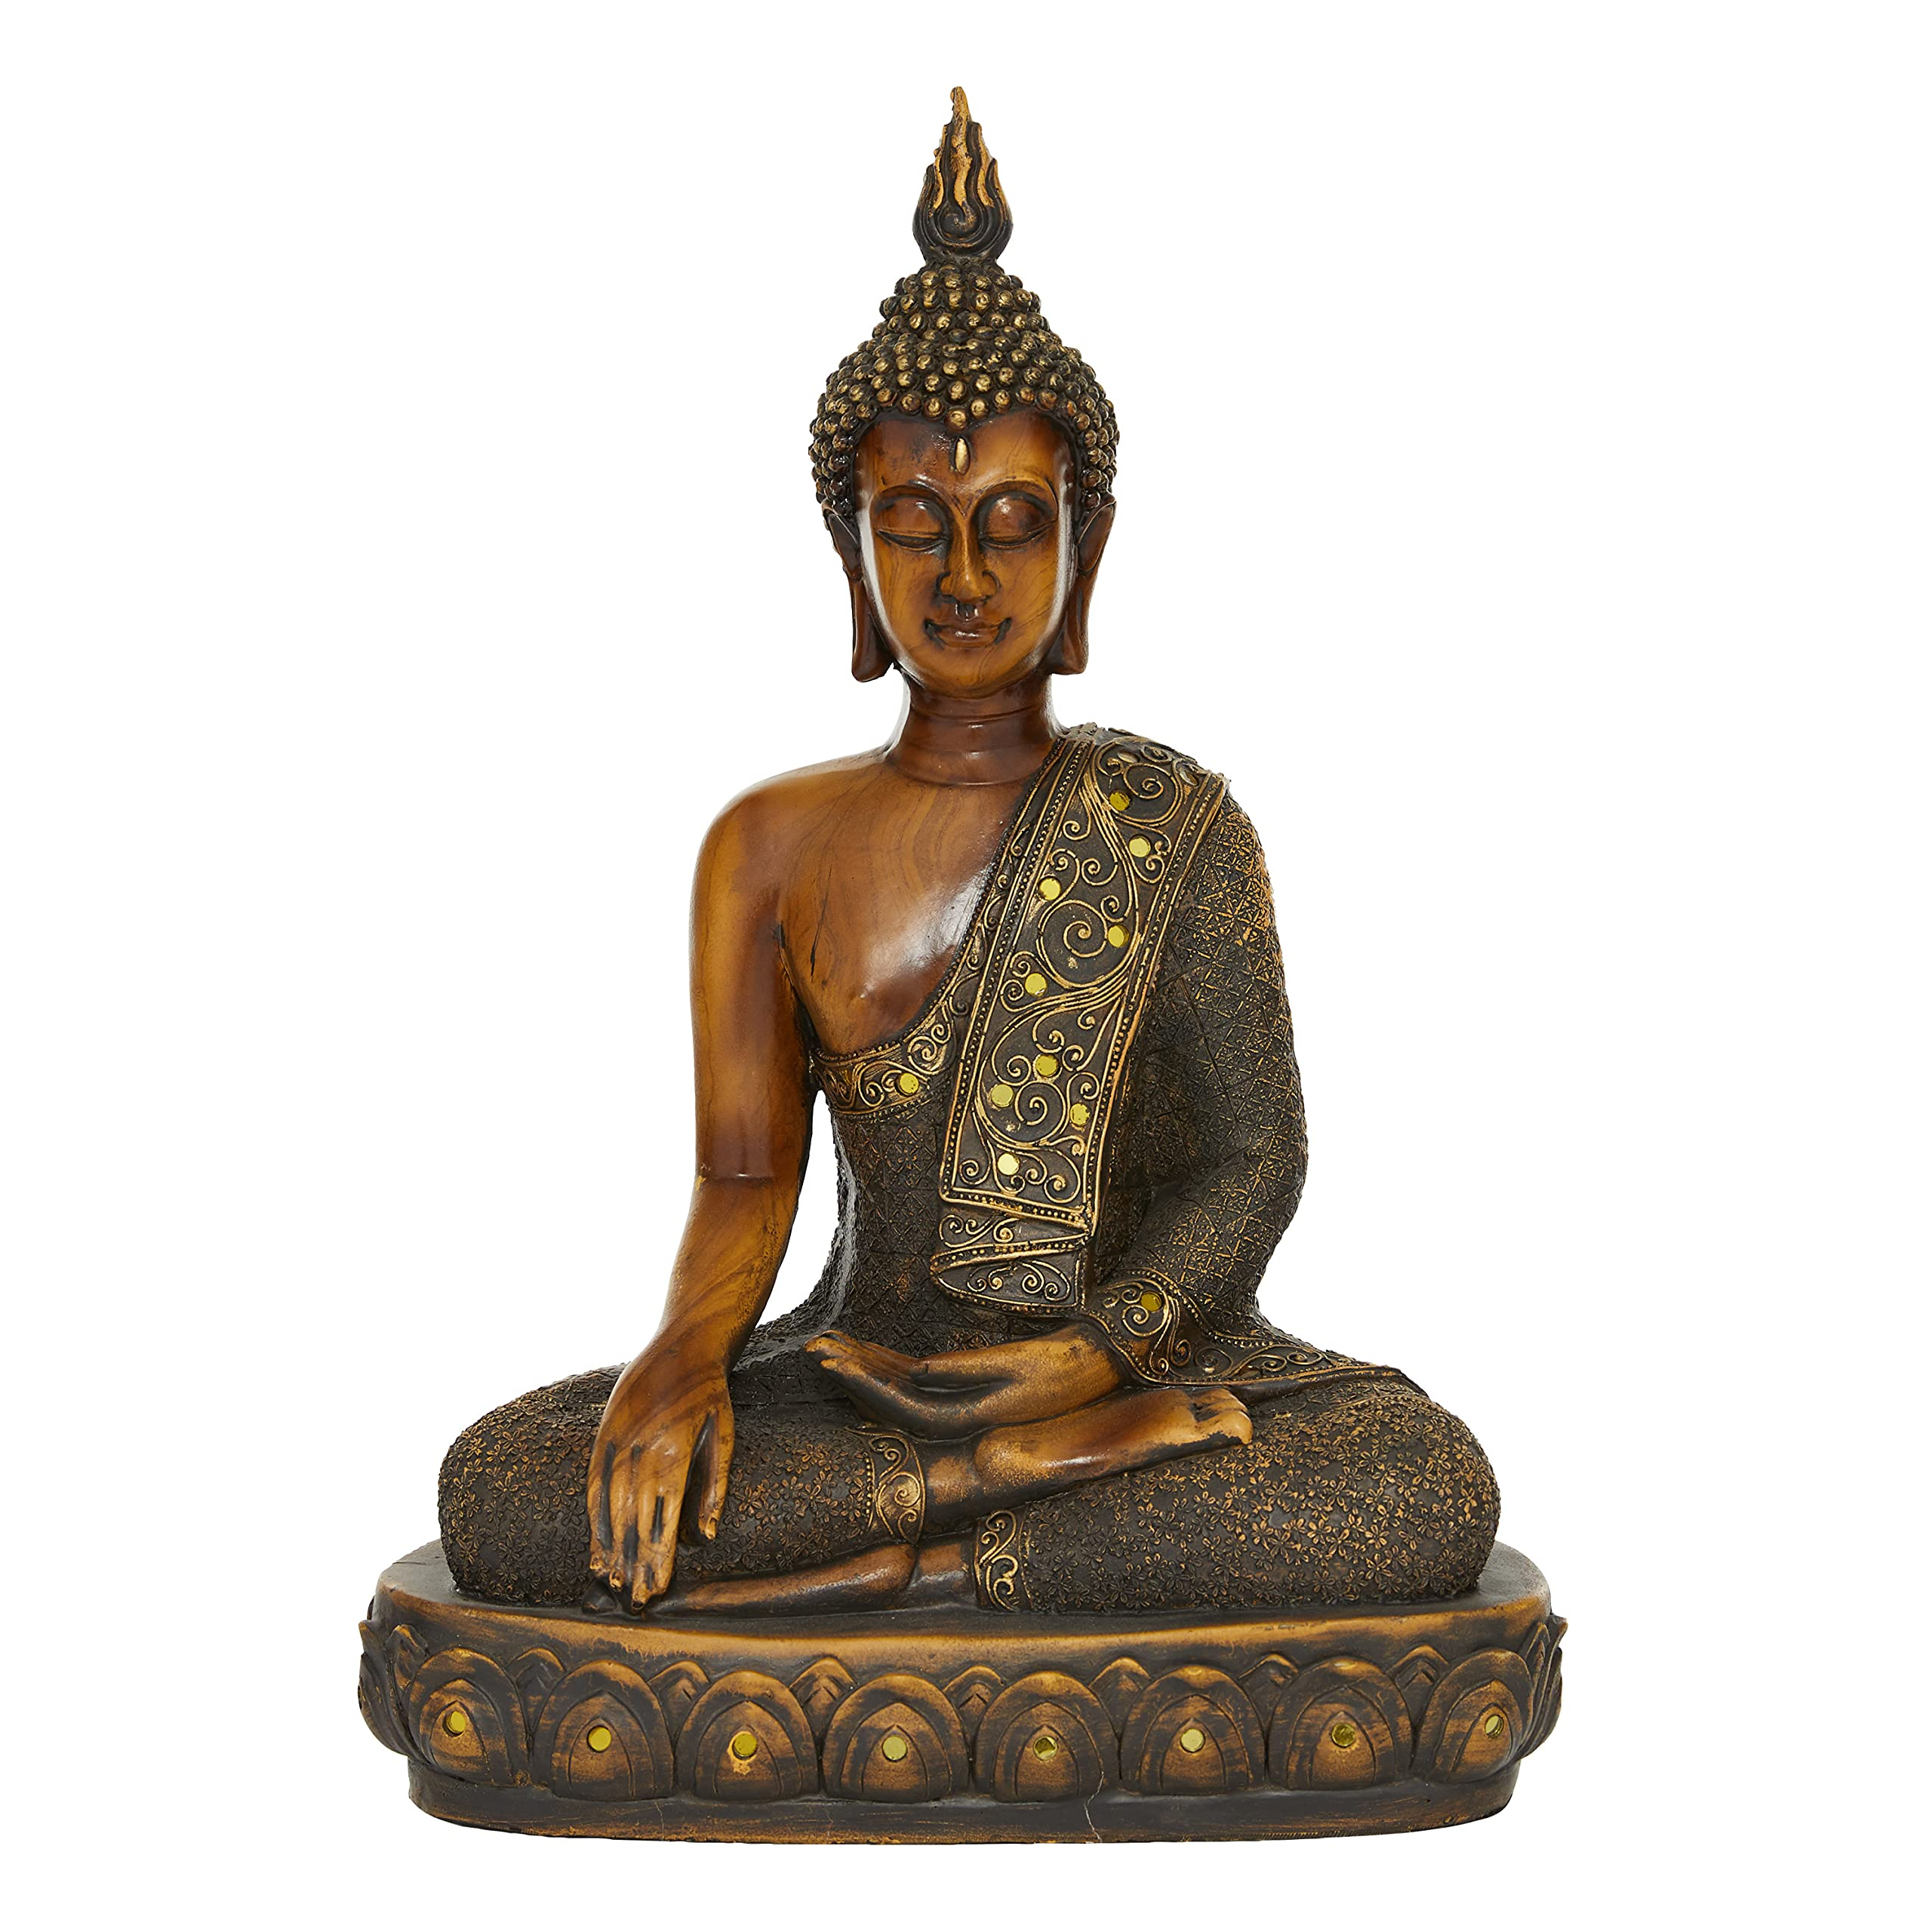 "Benzara Asian-Themed Sitting Polystone Buddha Sculpture, 15 by 12"", Textured Bronze Finish,44125"